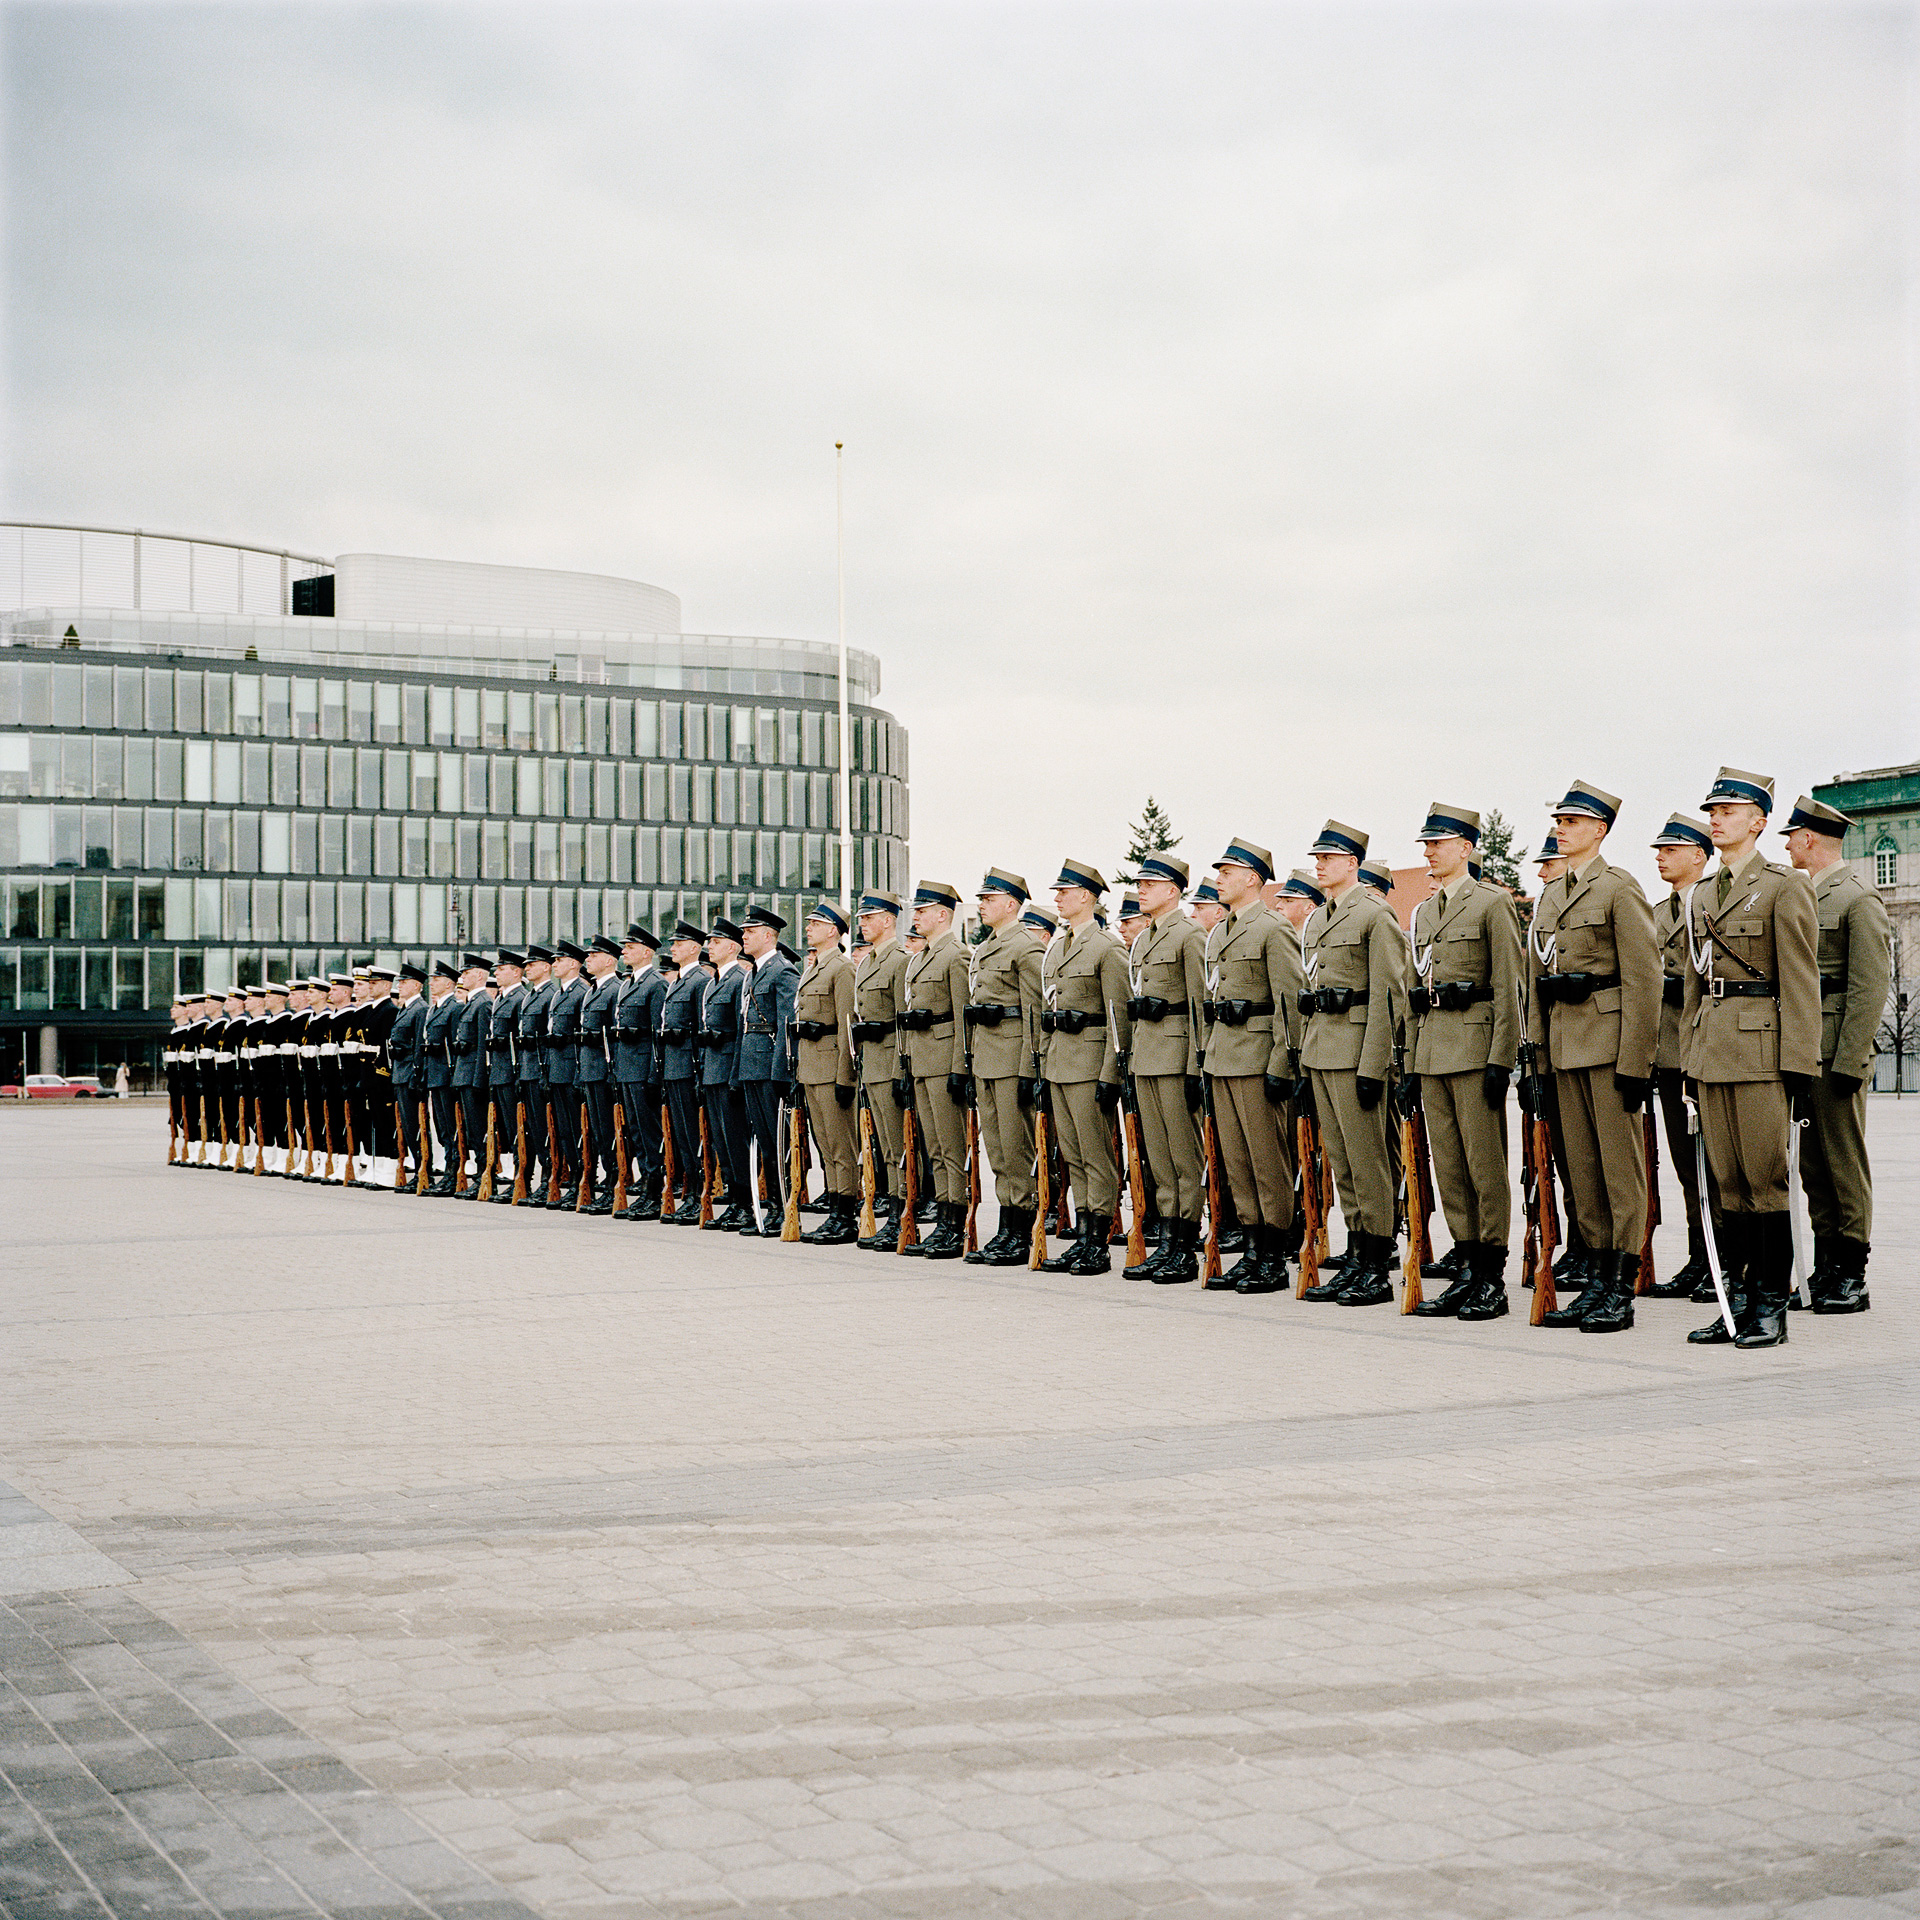 Leaving Minsk